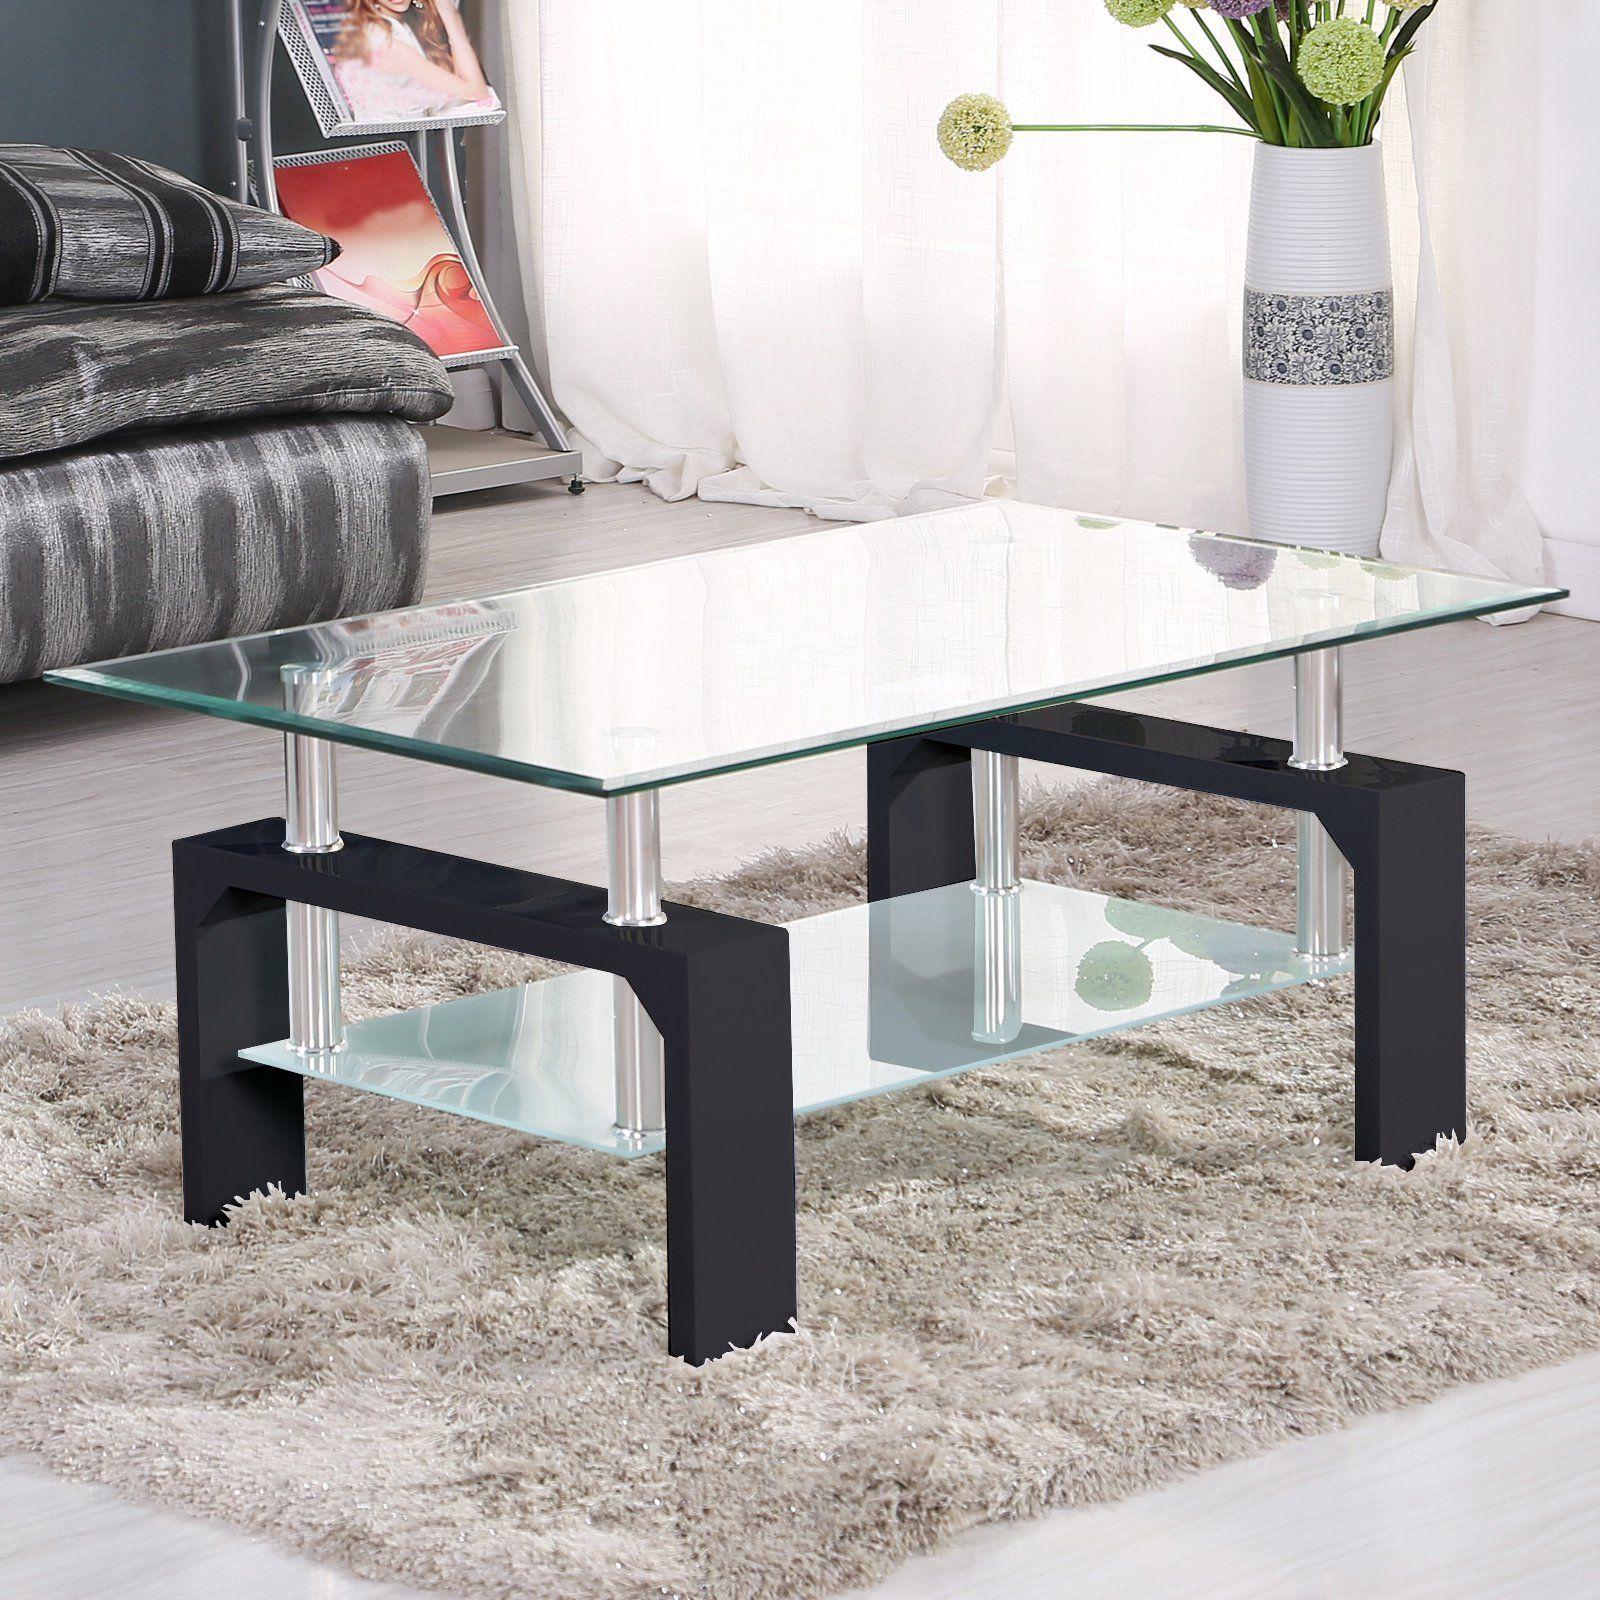 Uenjoy Rectangular Glass Coffee Table Shelf Chrome Black Wood Living Room Furniture Black Walma Coffee Table Small Space Coffee Table Coffee Table With Shelf [ 1600 x 1600 Pixel ]